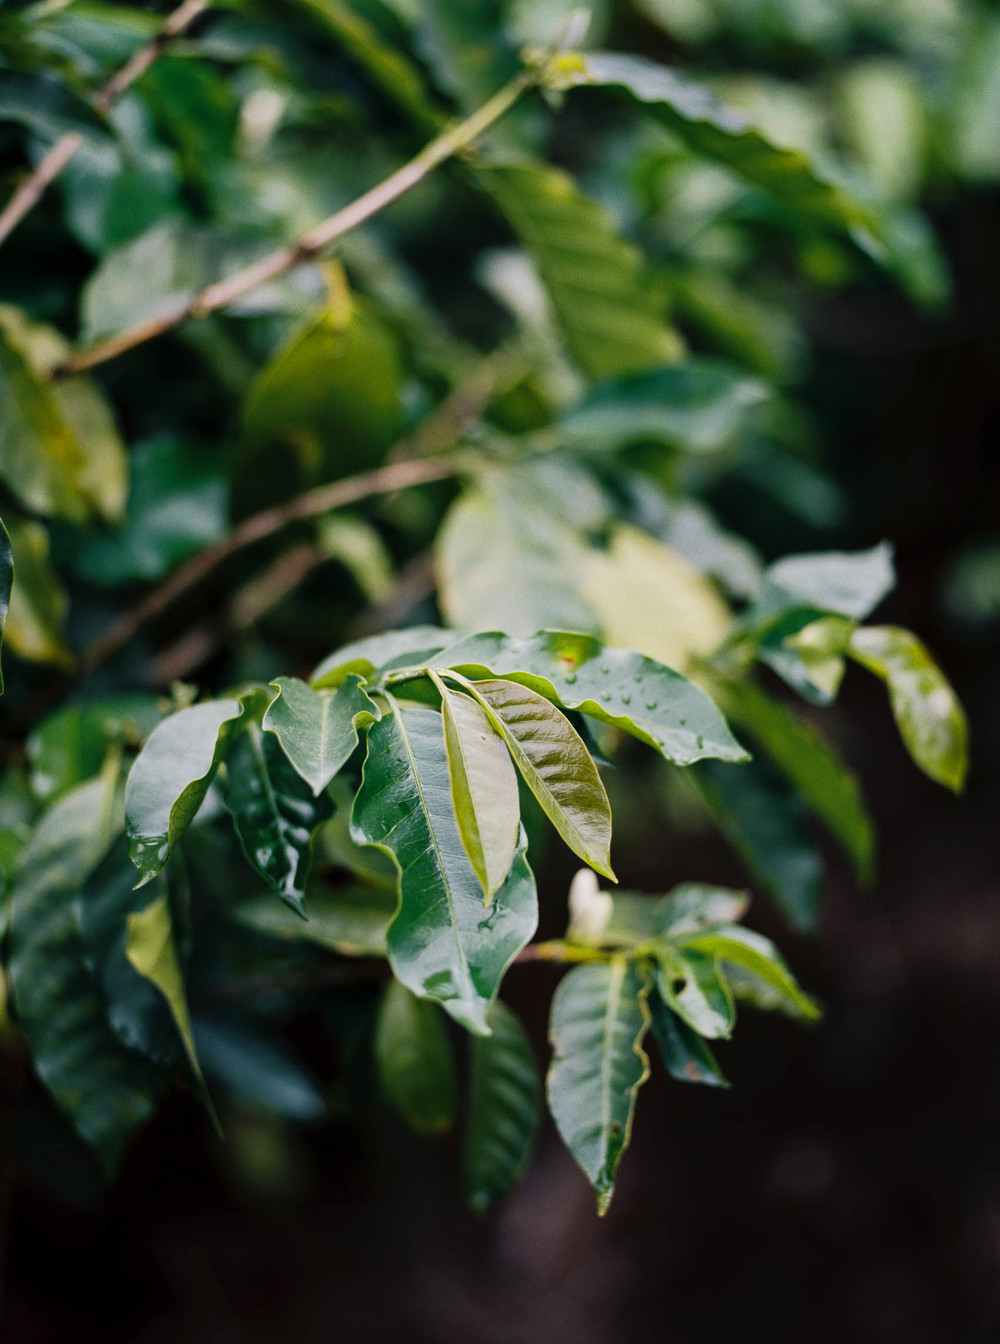 Alyssa Joy Photography - Costa Rica travel photographer